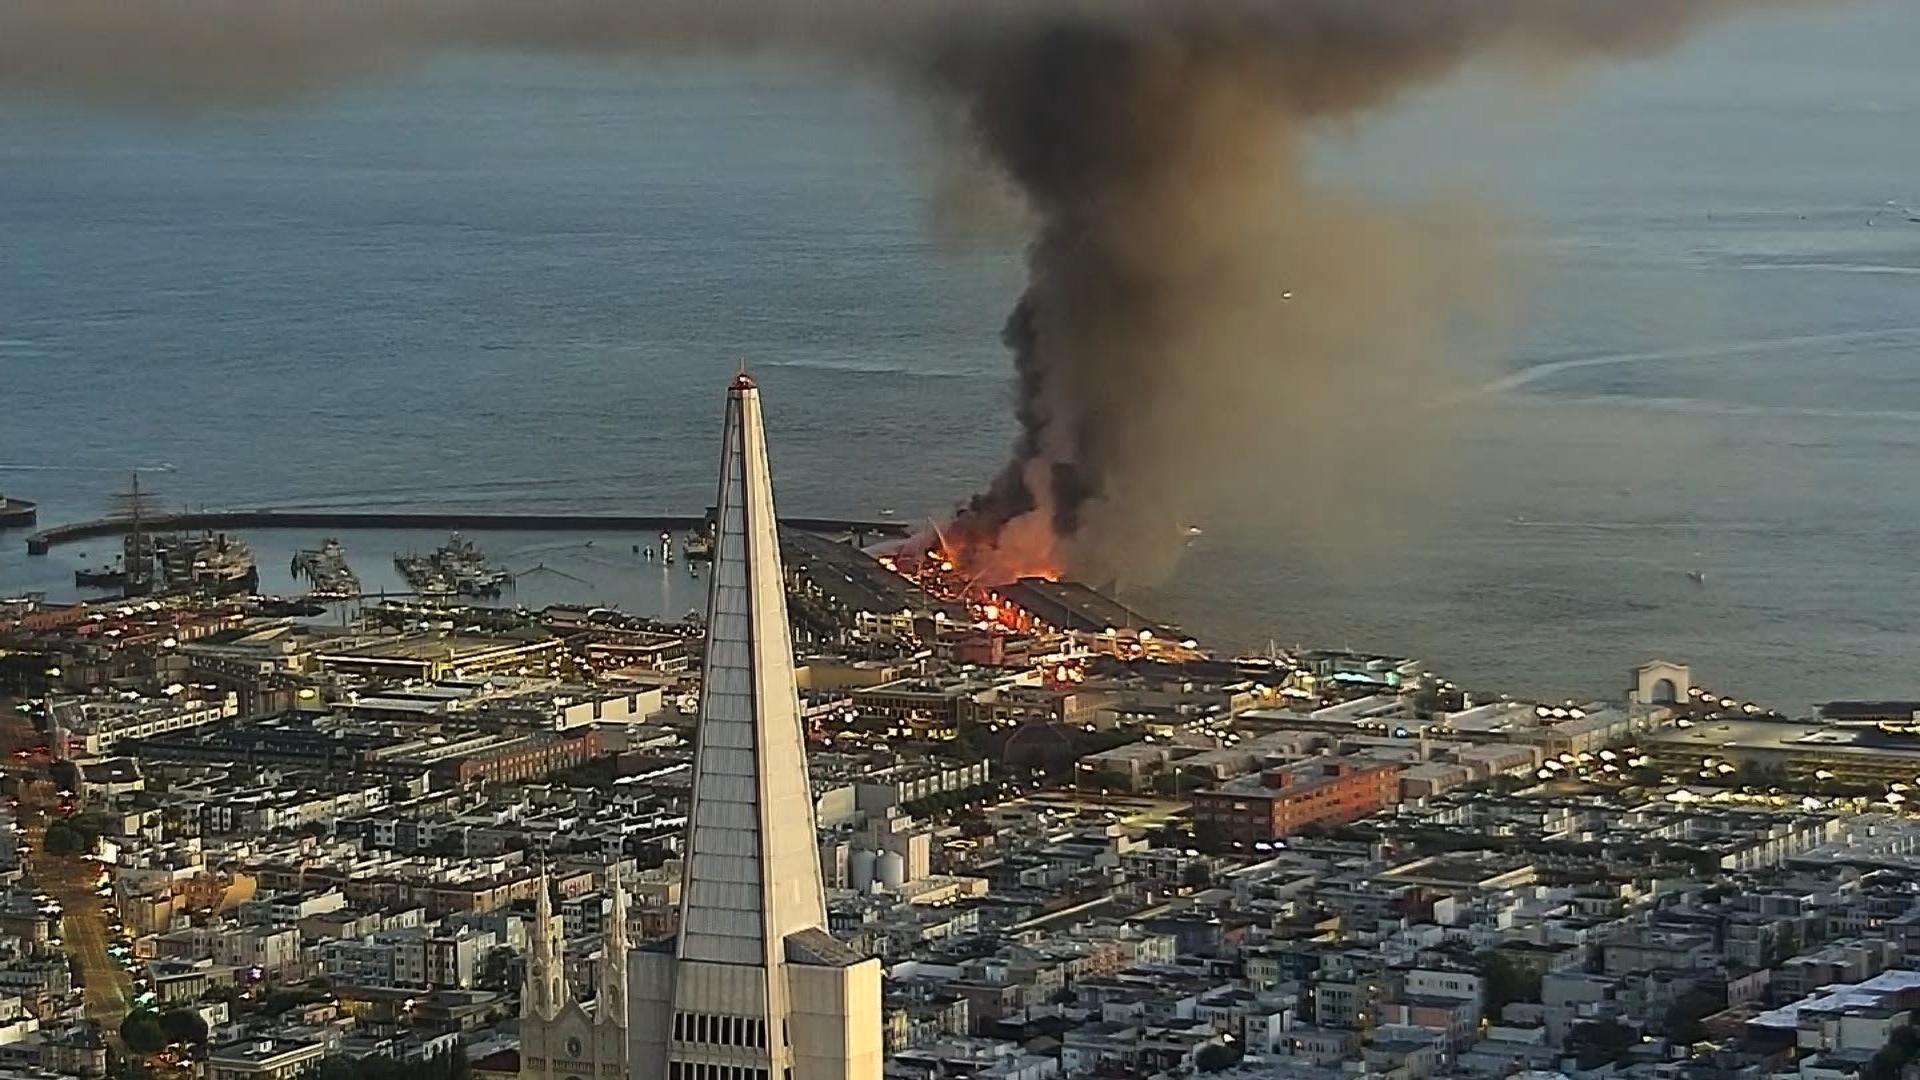 San Francisco firefighters battled a a warehouse fire at Pier 45 on May 23, 2020. (KPIX via CNN)